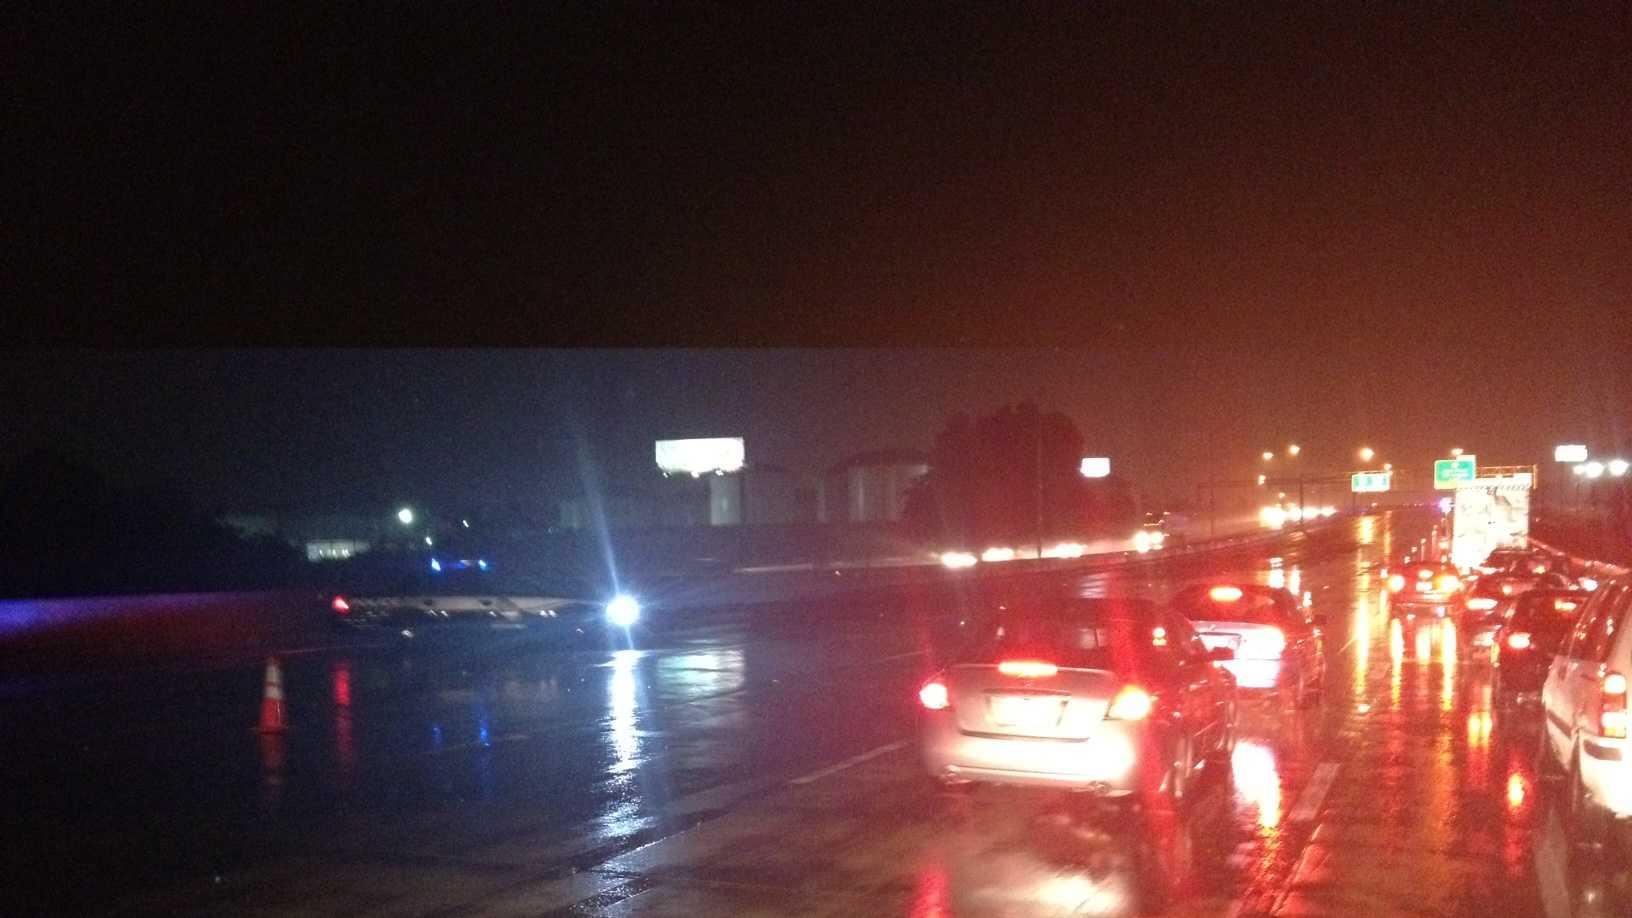 I-40 at exit 211 on Monday night (photo by WXII's Craig Marimpietri)